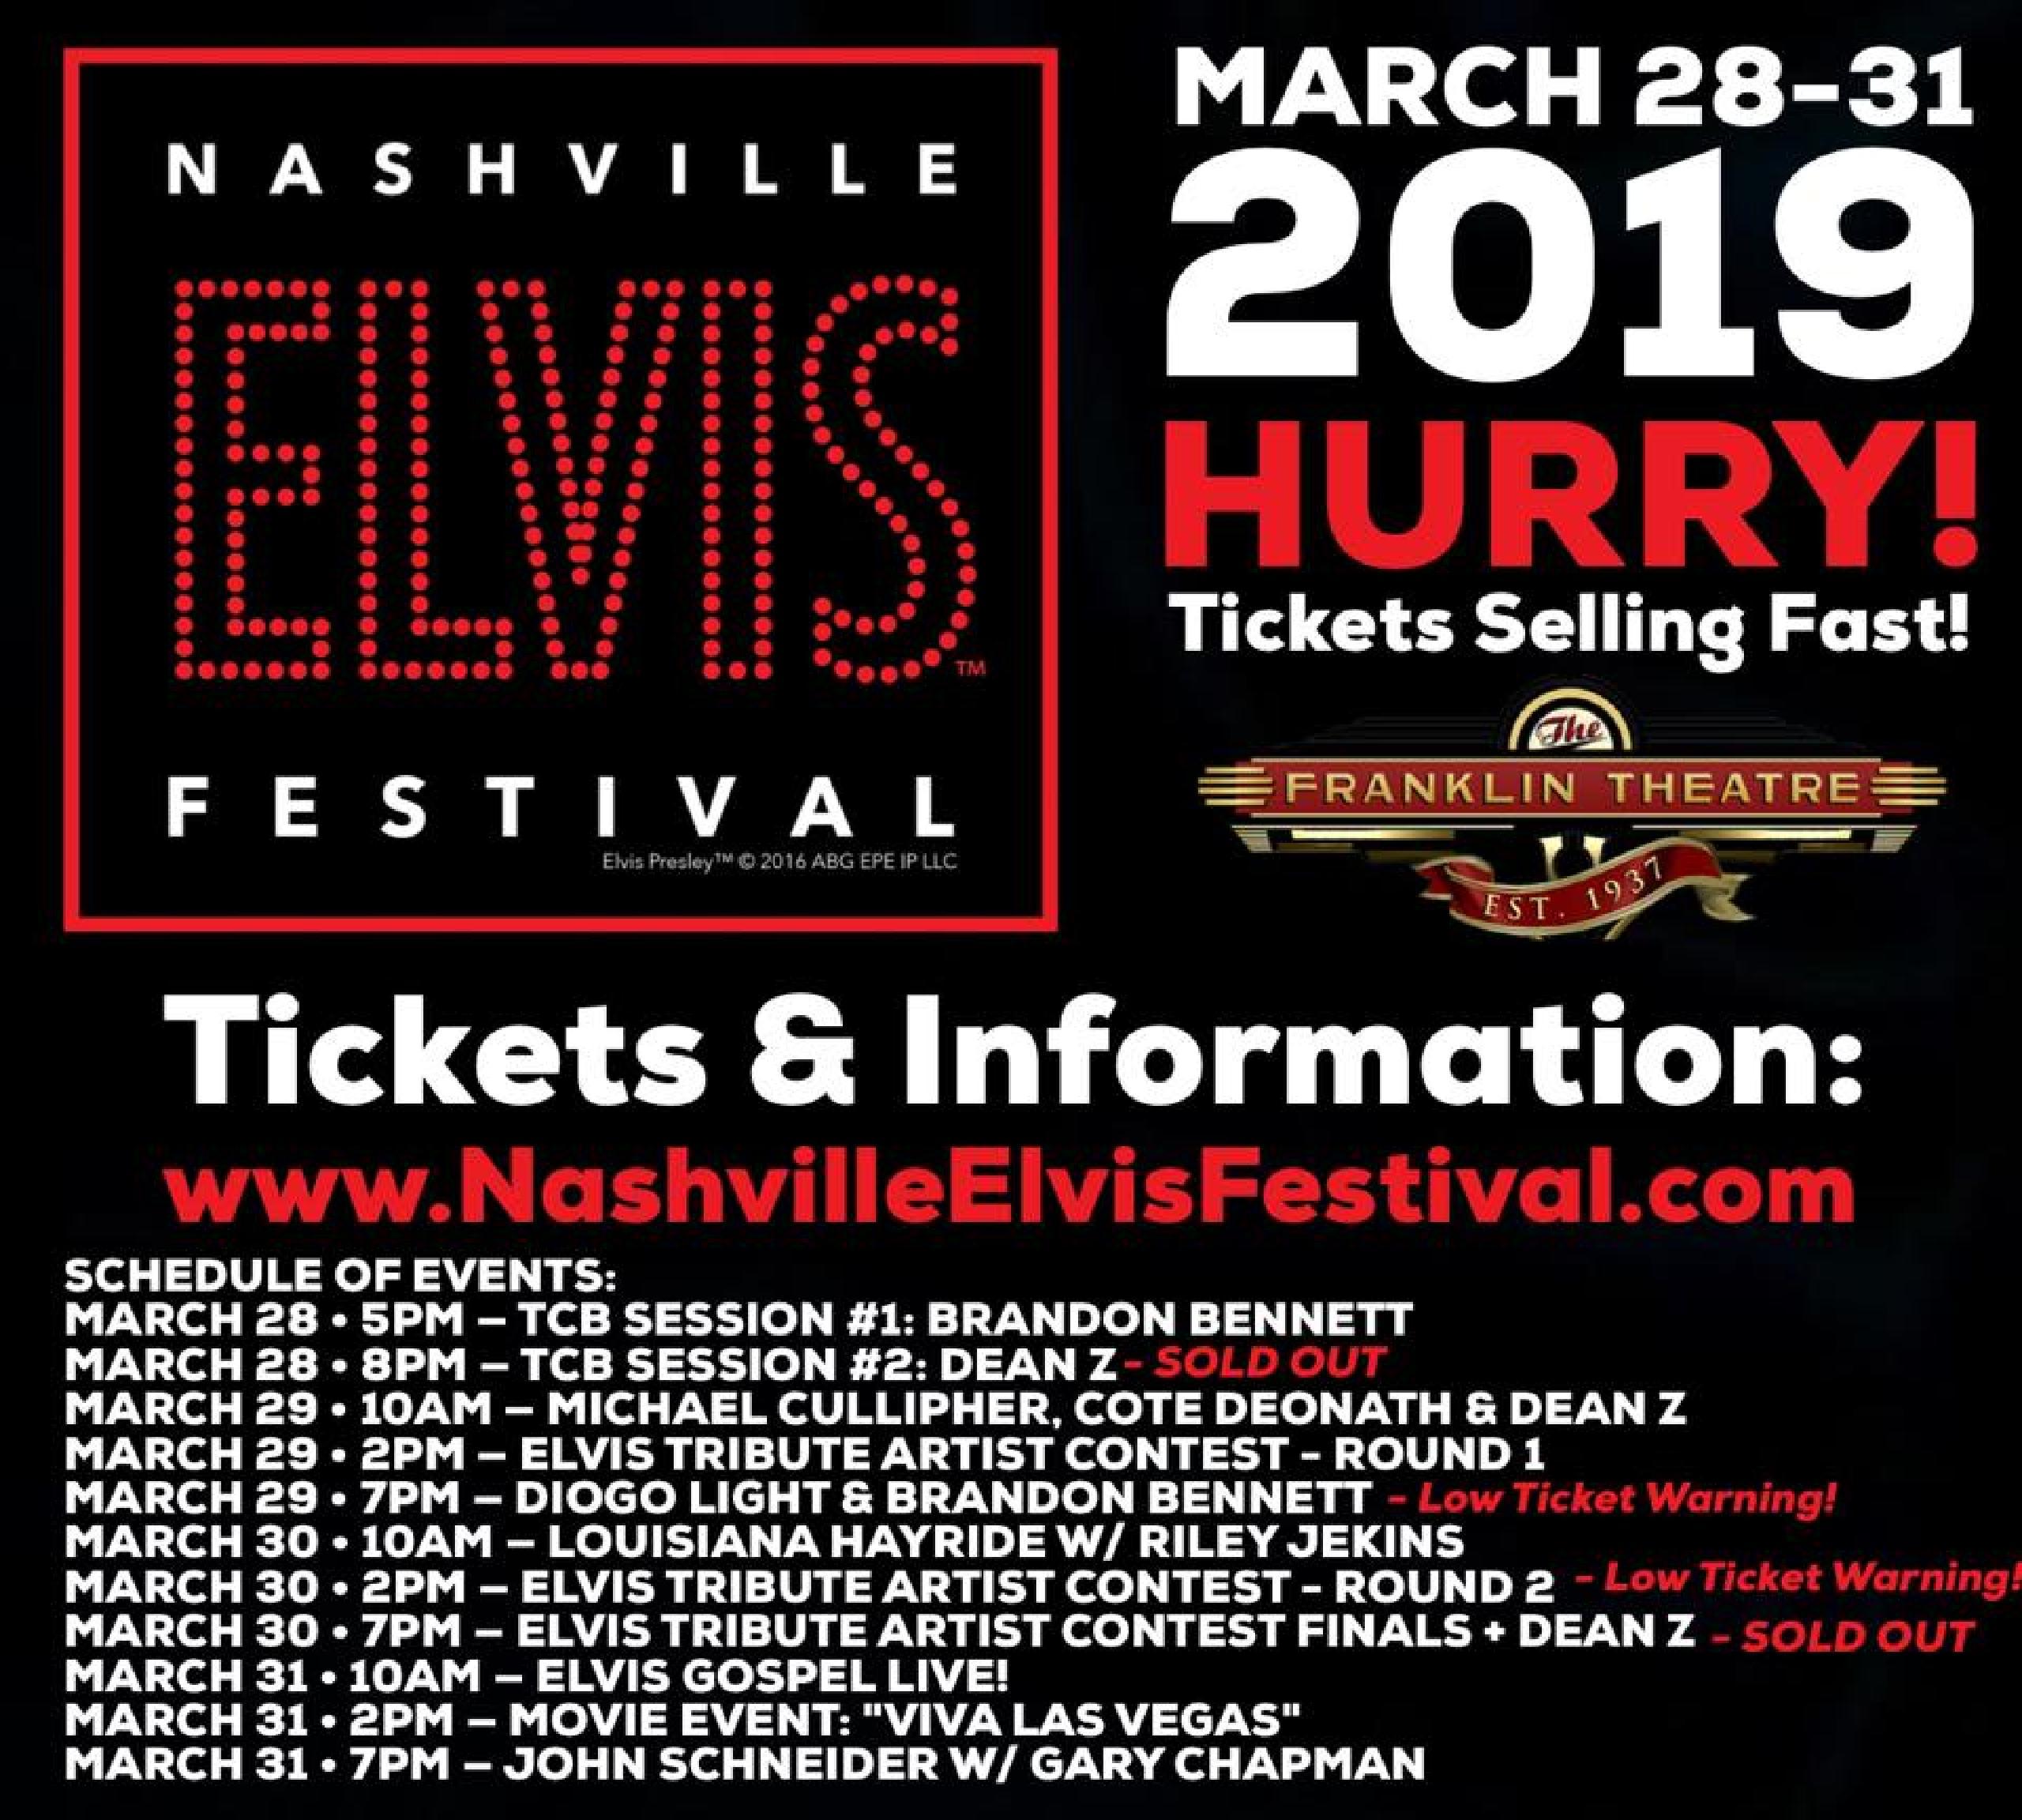 Nashville Elvis Festival Lineup